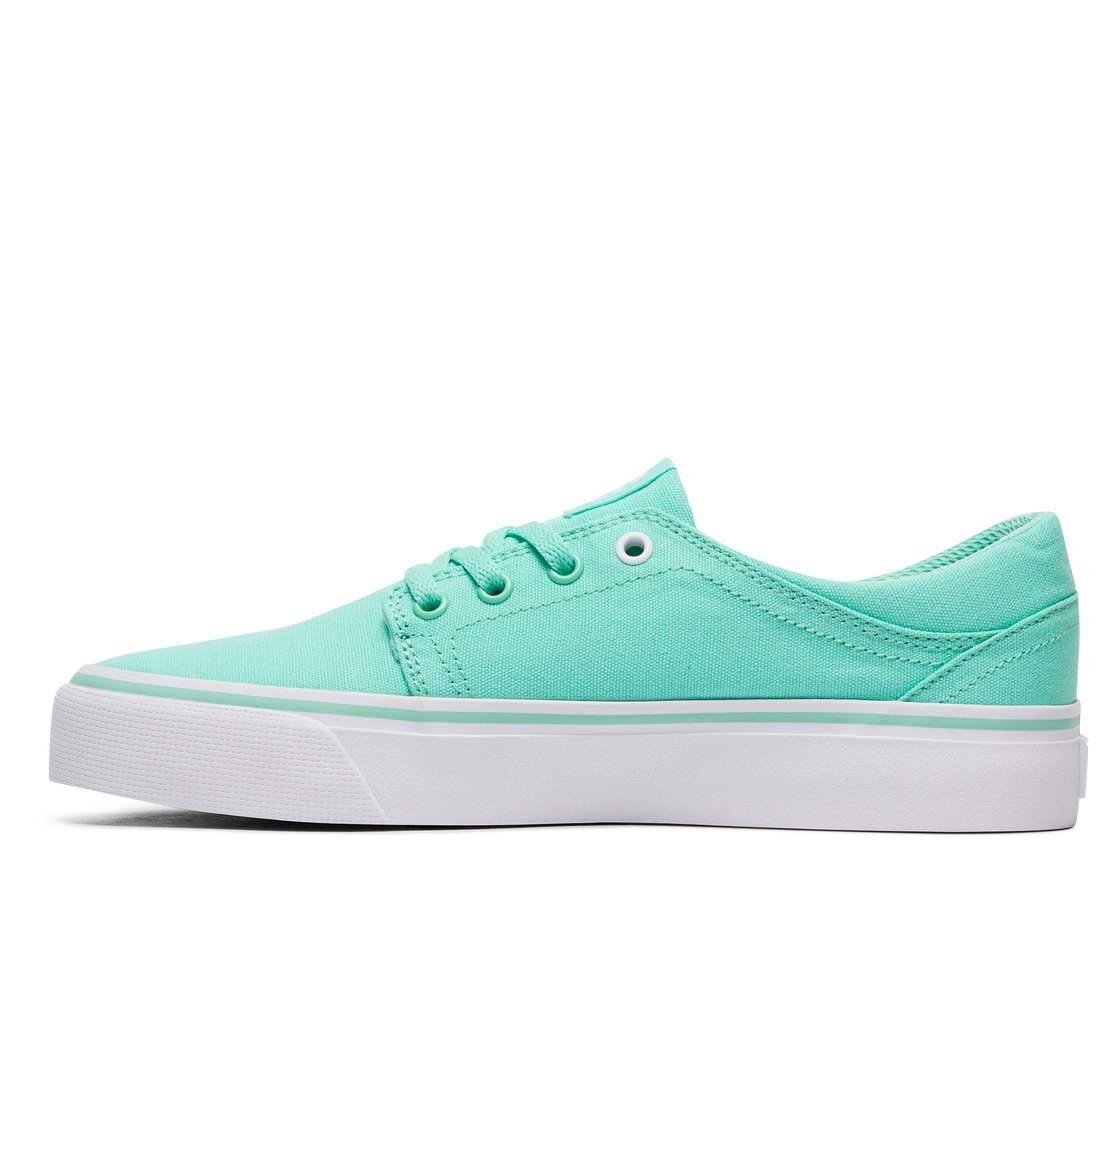 Trase TX - Baskets - Vert - DC Shoes vmJK2lQUs